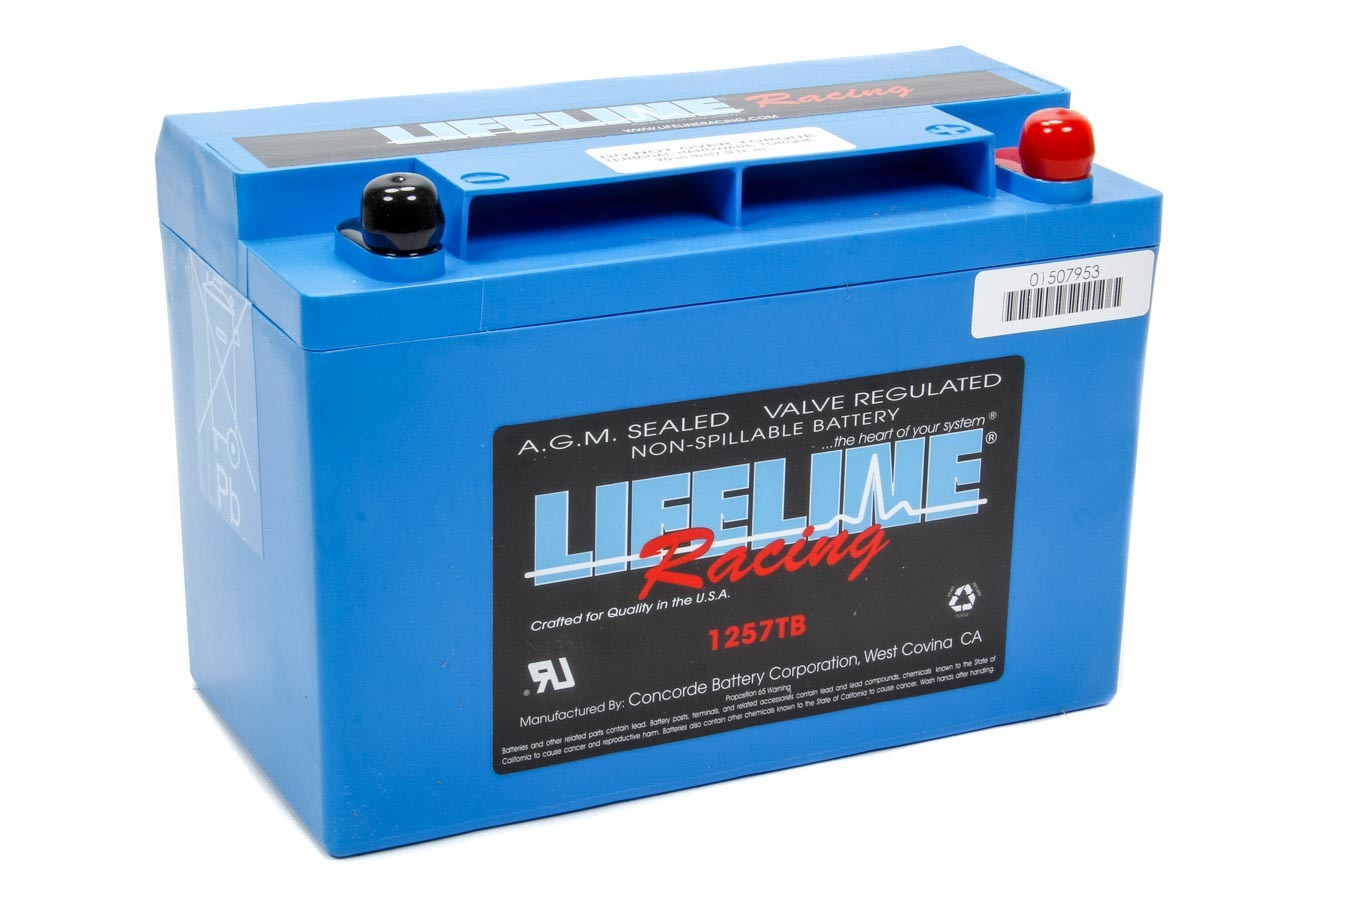 Lifeline Battery Power Cell Battery 9.75x5.25x6.875